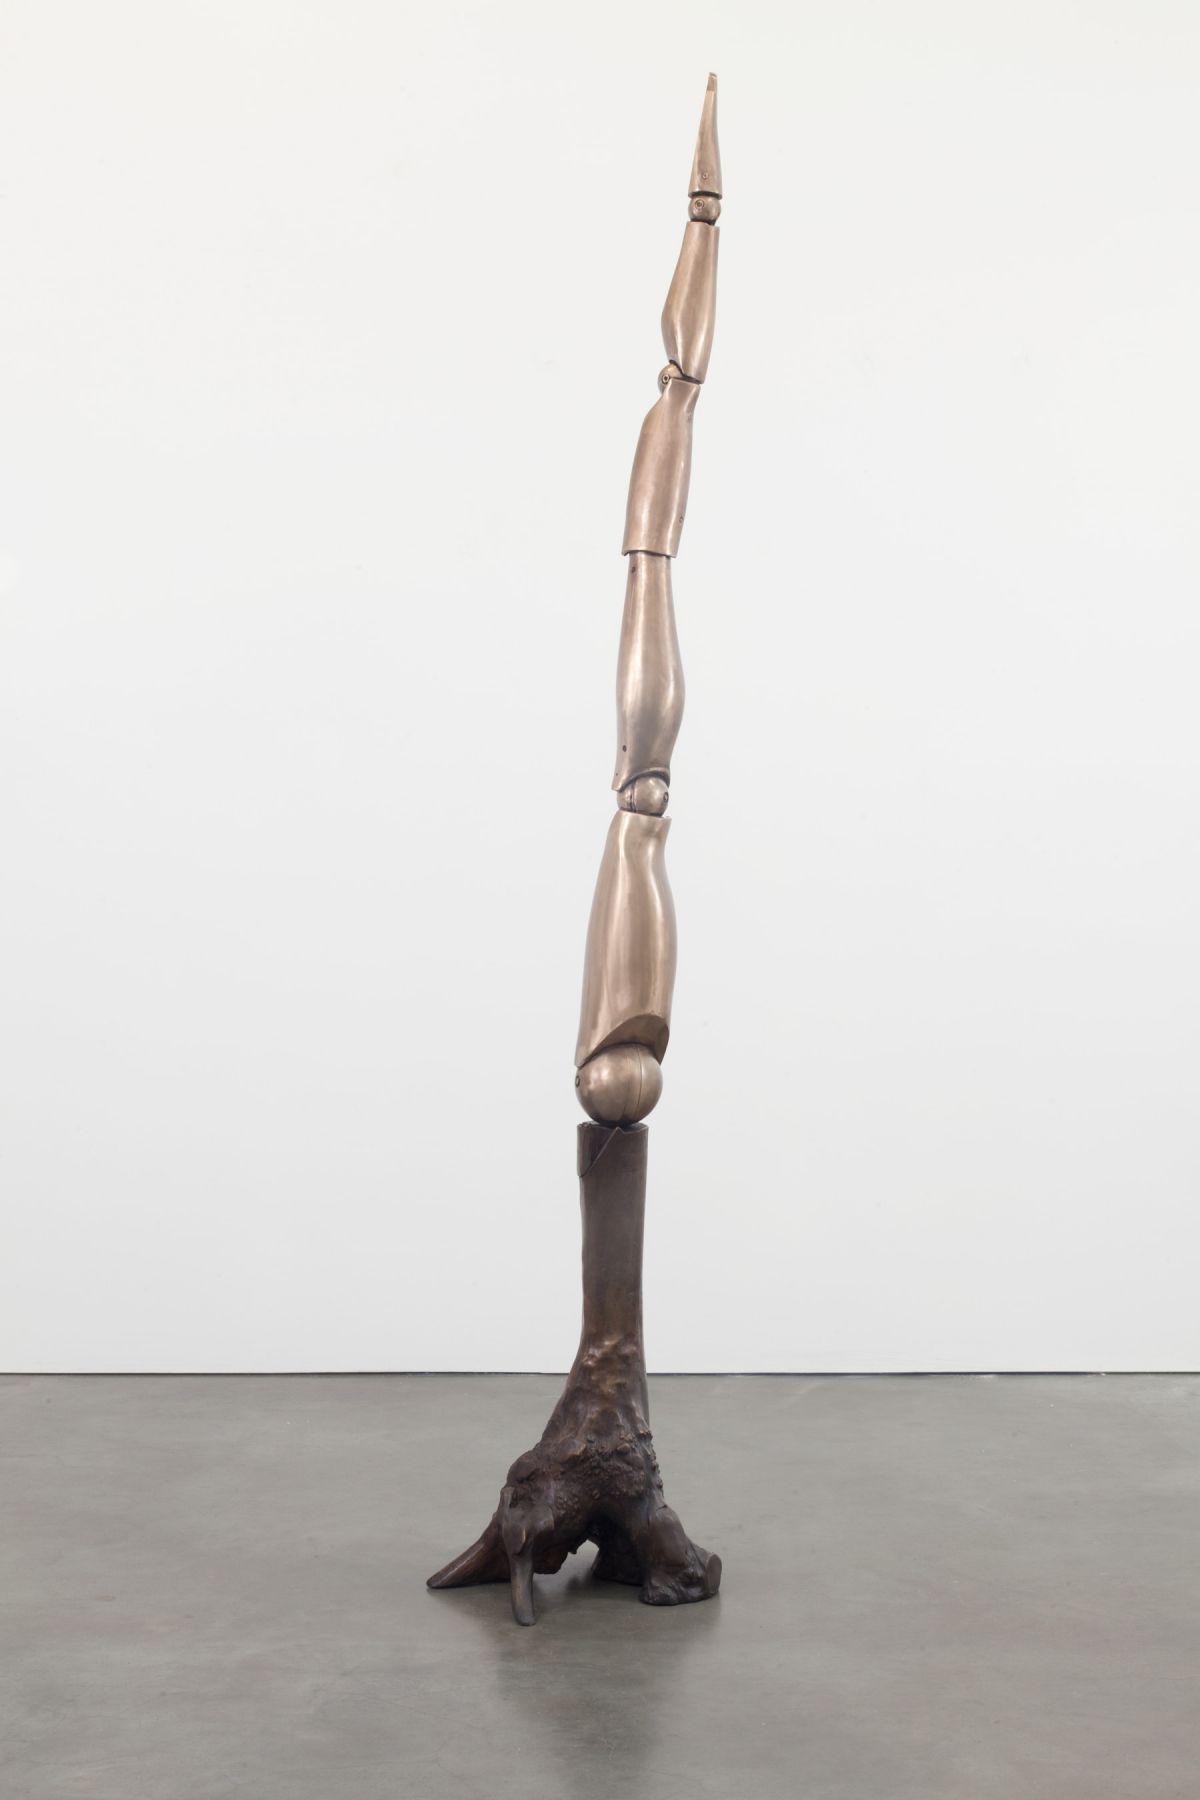 Elliott Hundley, Standing Figure